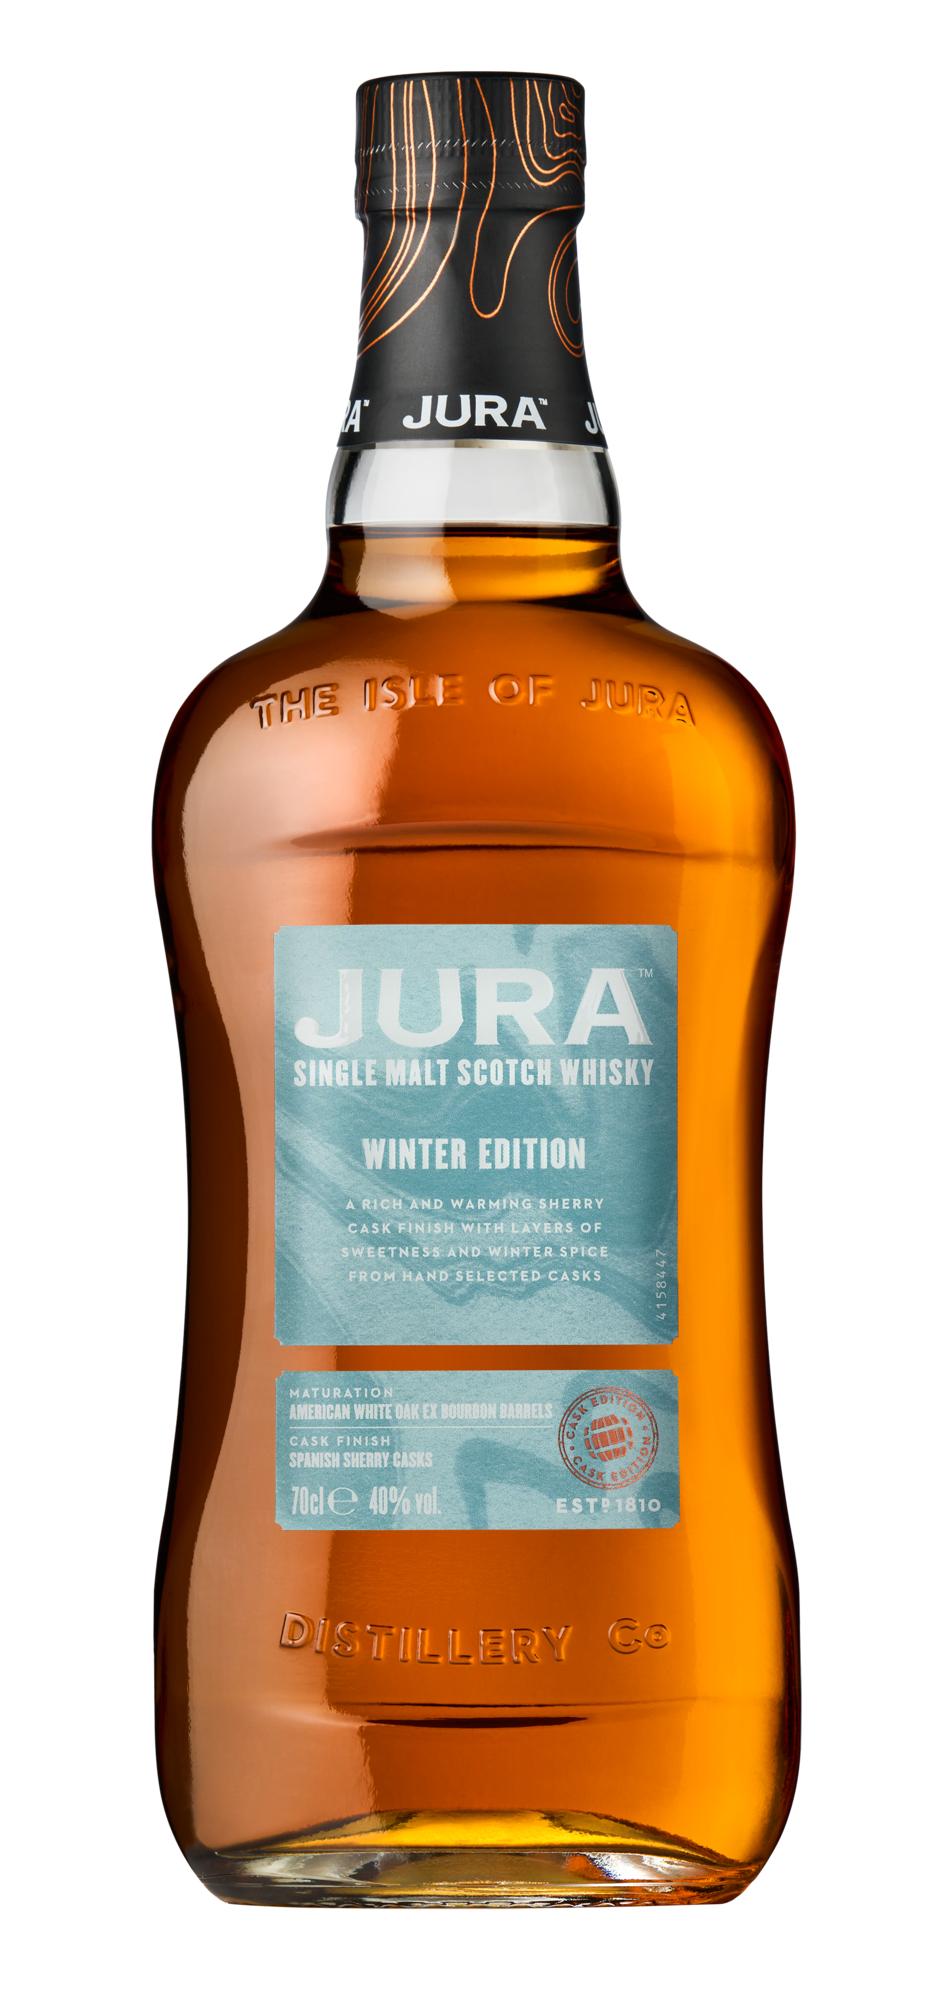 Jura Single Malt Scotch Whisky Winter Edition 1 Litre £24.75 @ Tesco Chorley